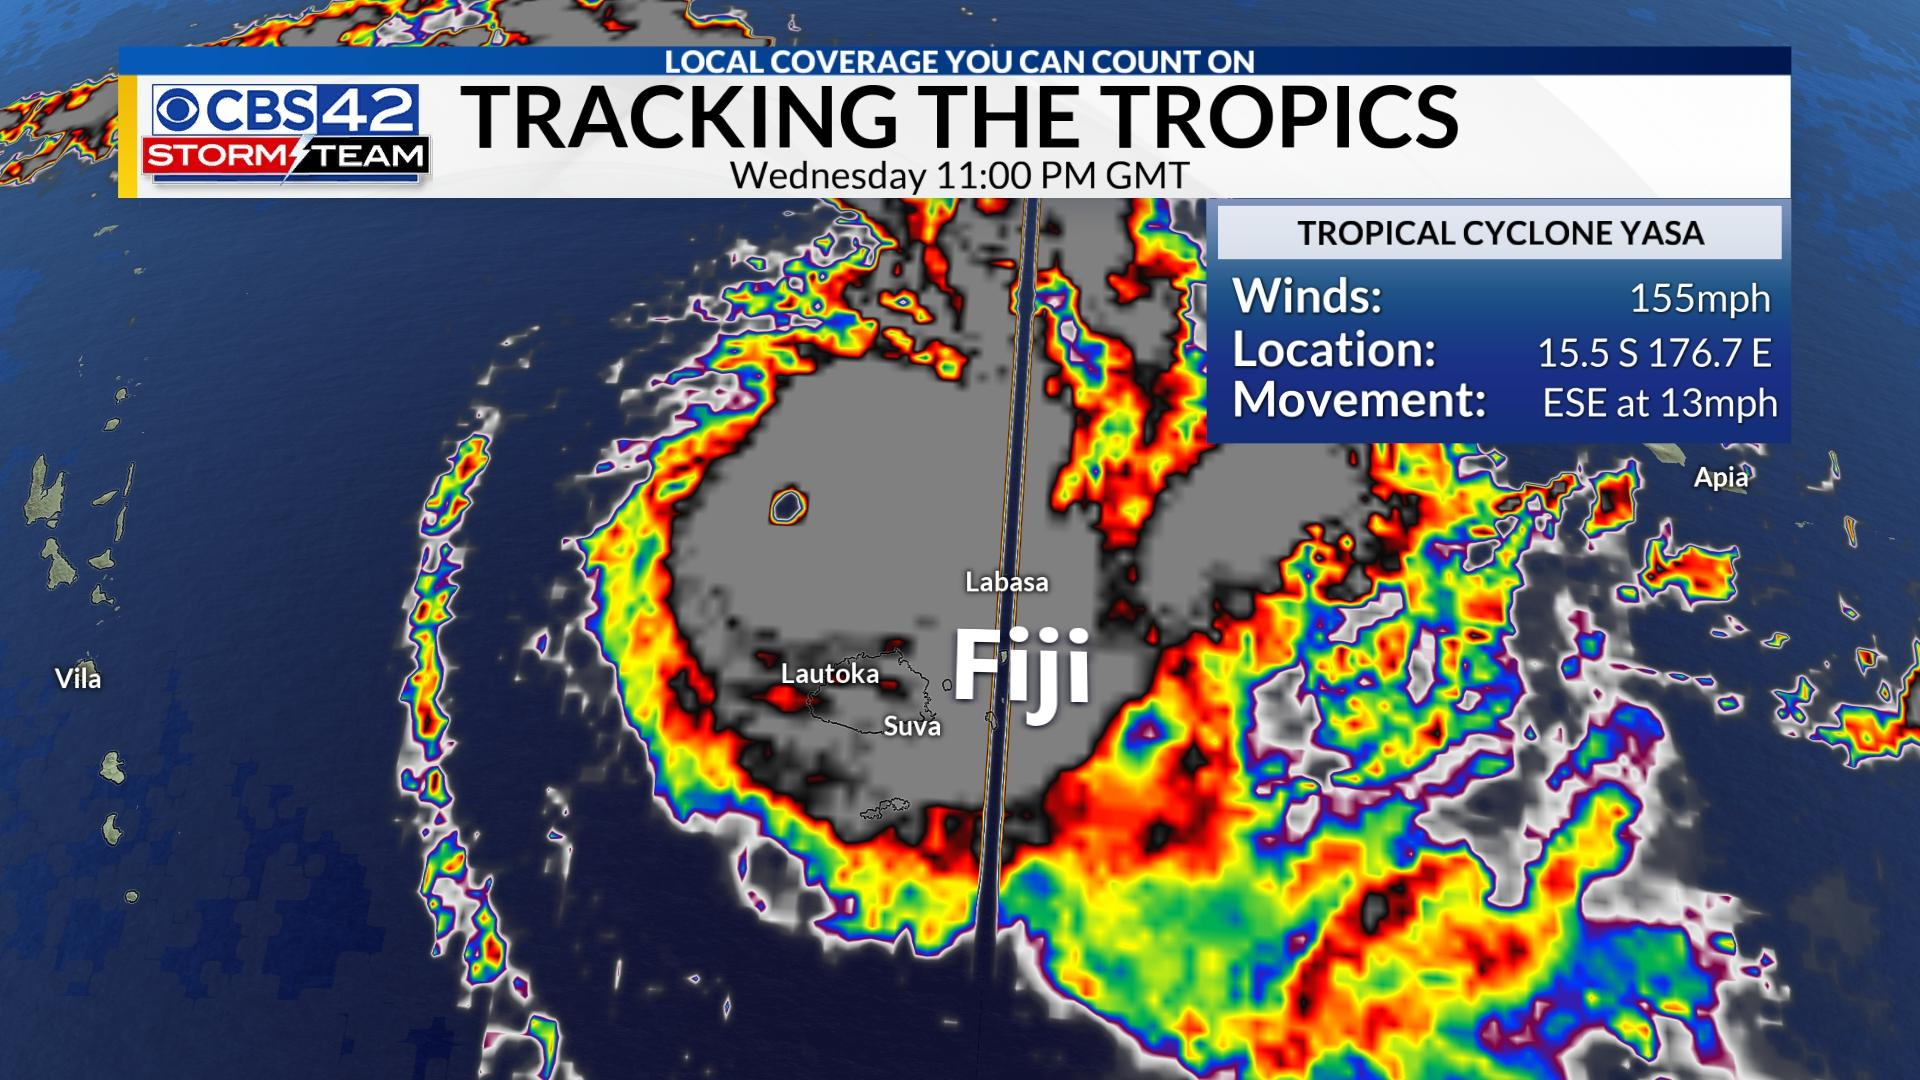 Powerful Tropical Cyclone Yasa Closing In On Fiji Cbs 42